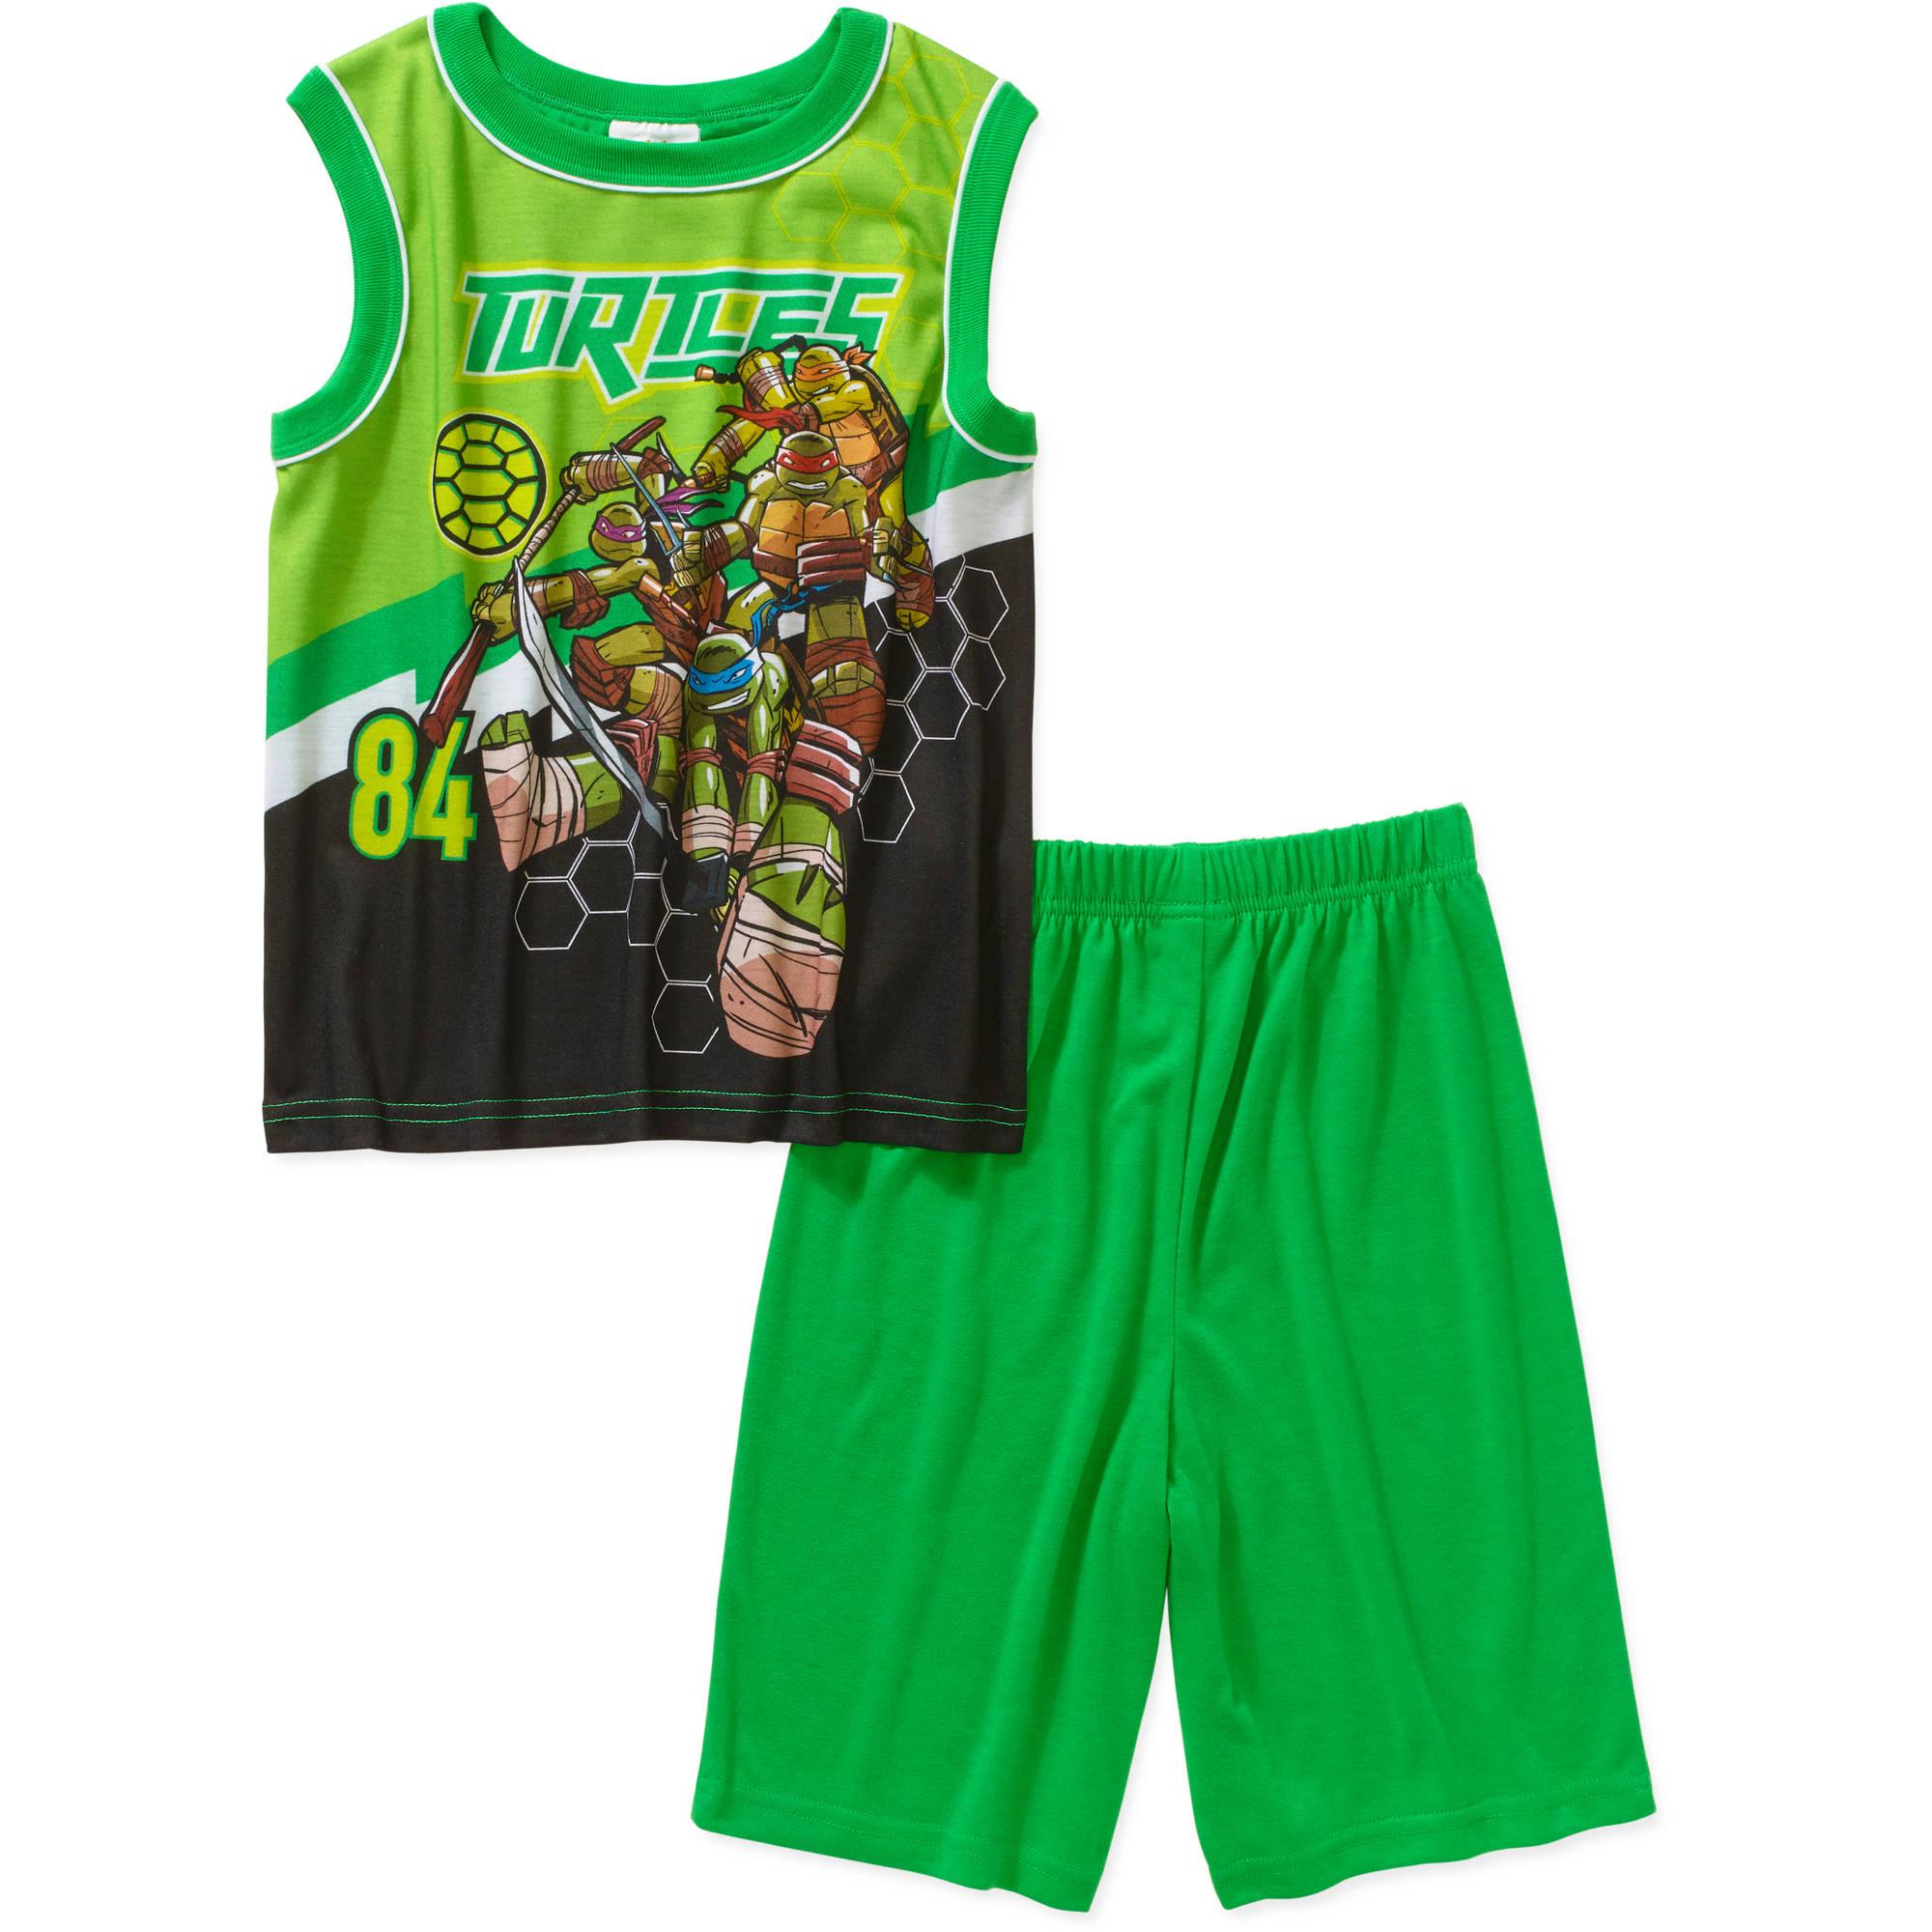 Teenage Mutant Ninja Turtles Boys' License Muscle Sleep Shirt and Short 2 Piece Pajama Set